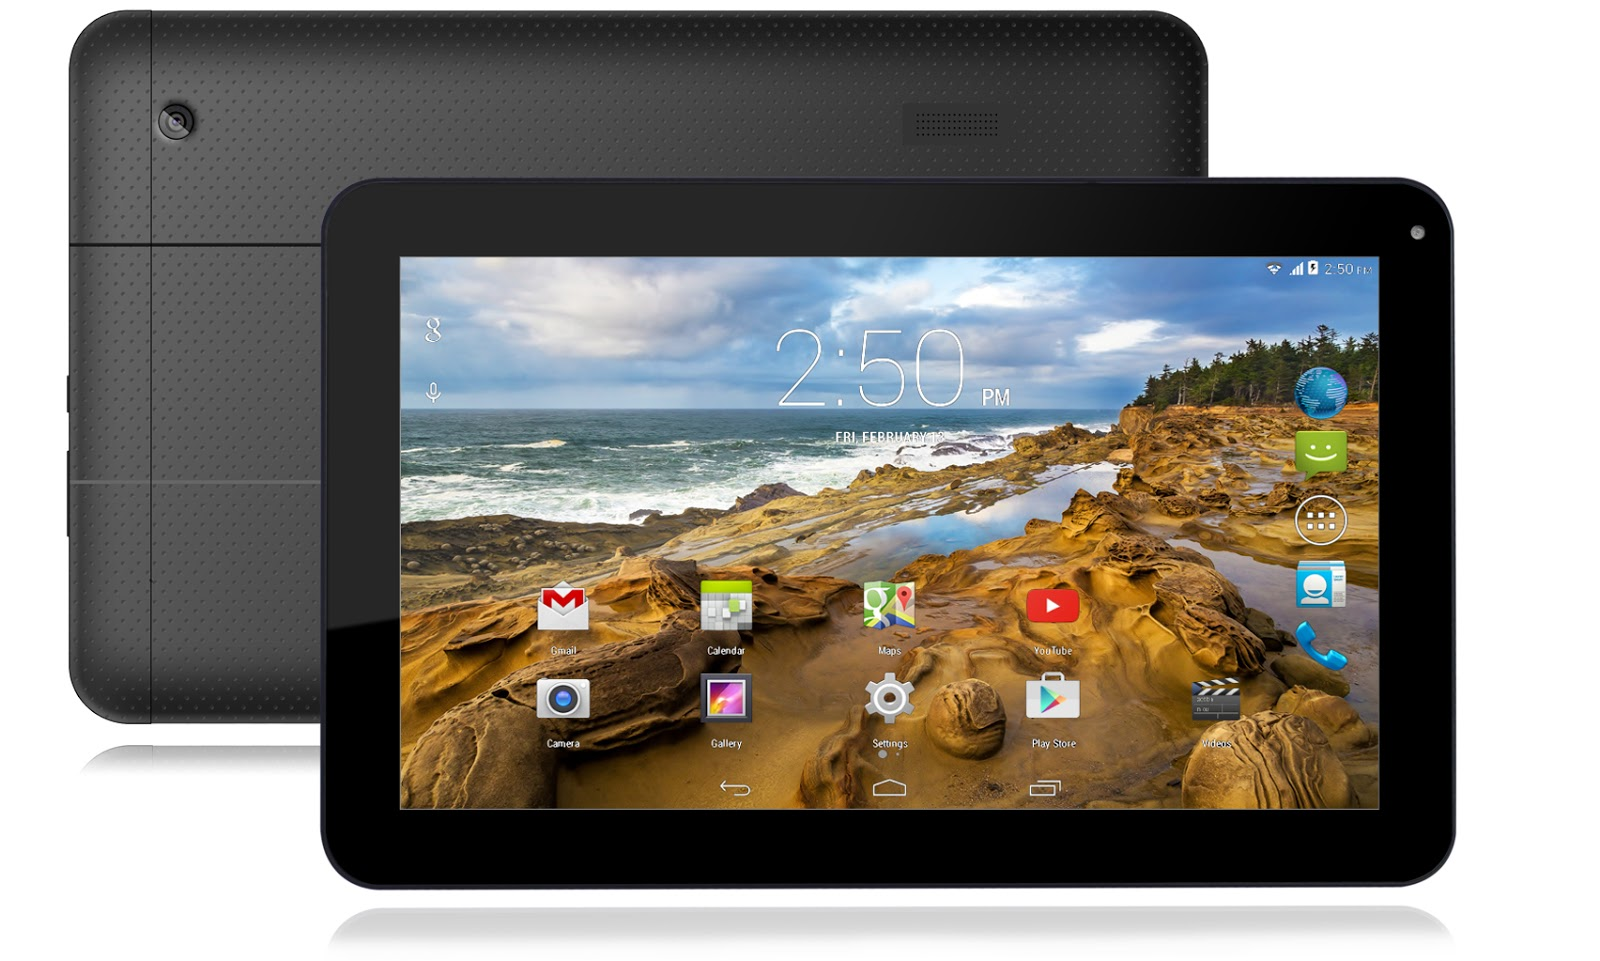 Vonino participă la CeBIT 2015, unde lansează noua tableta 3G iMart QS şi modelul Vonino Argus QS